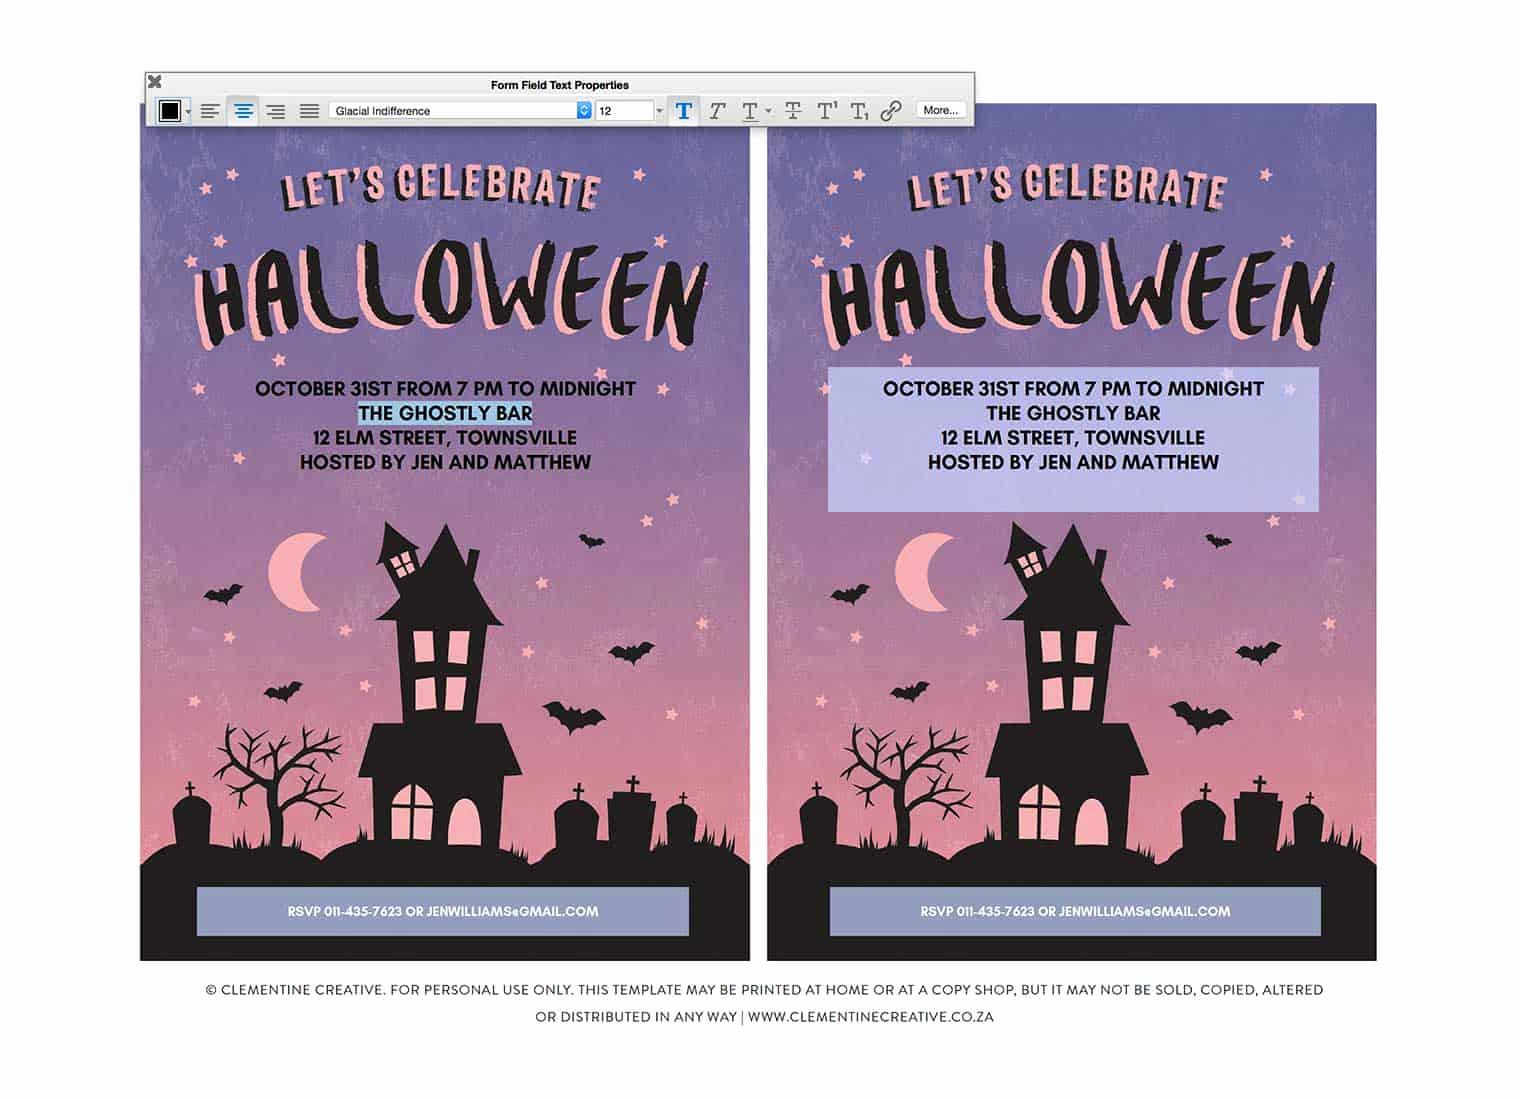 Halloween Party Invitations Templates Fresh Free Printable Halloween Party Invitation Haunted House